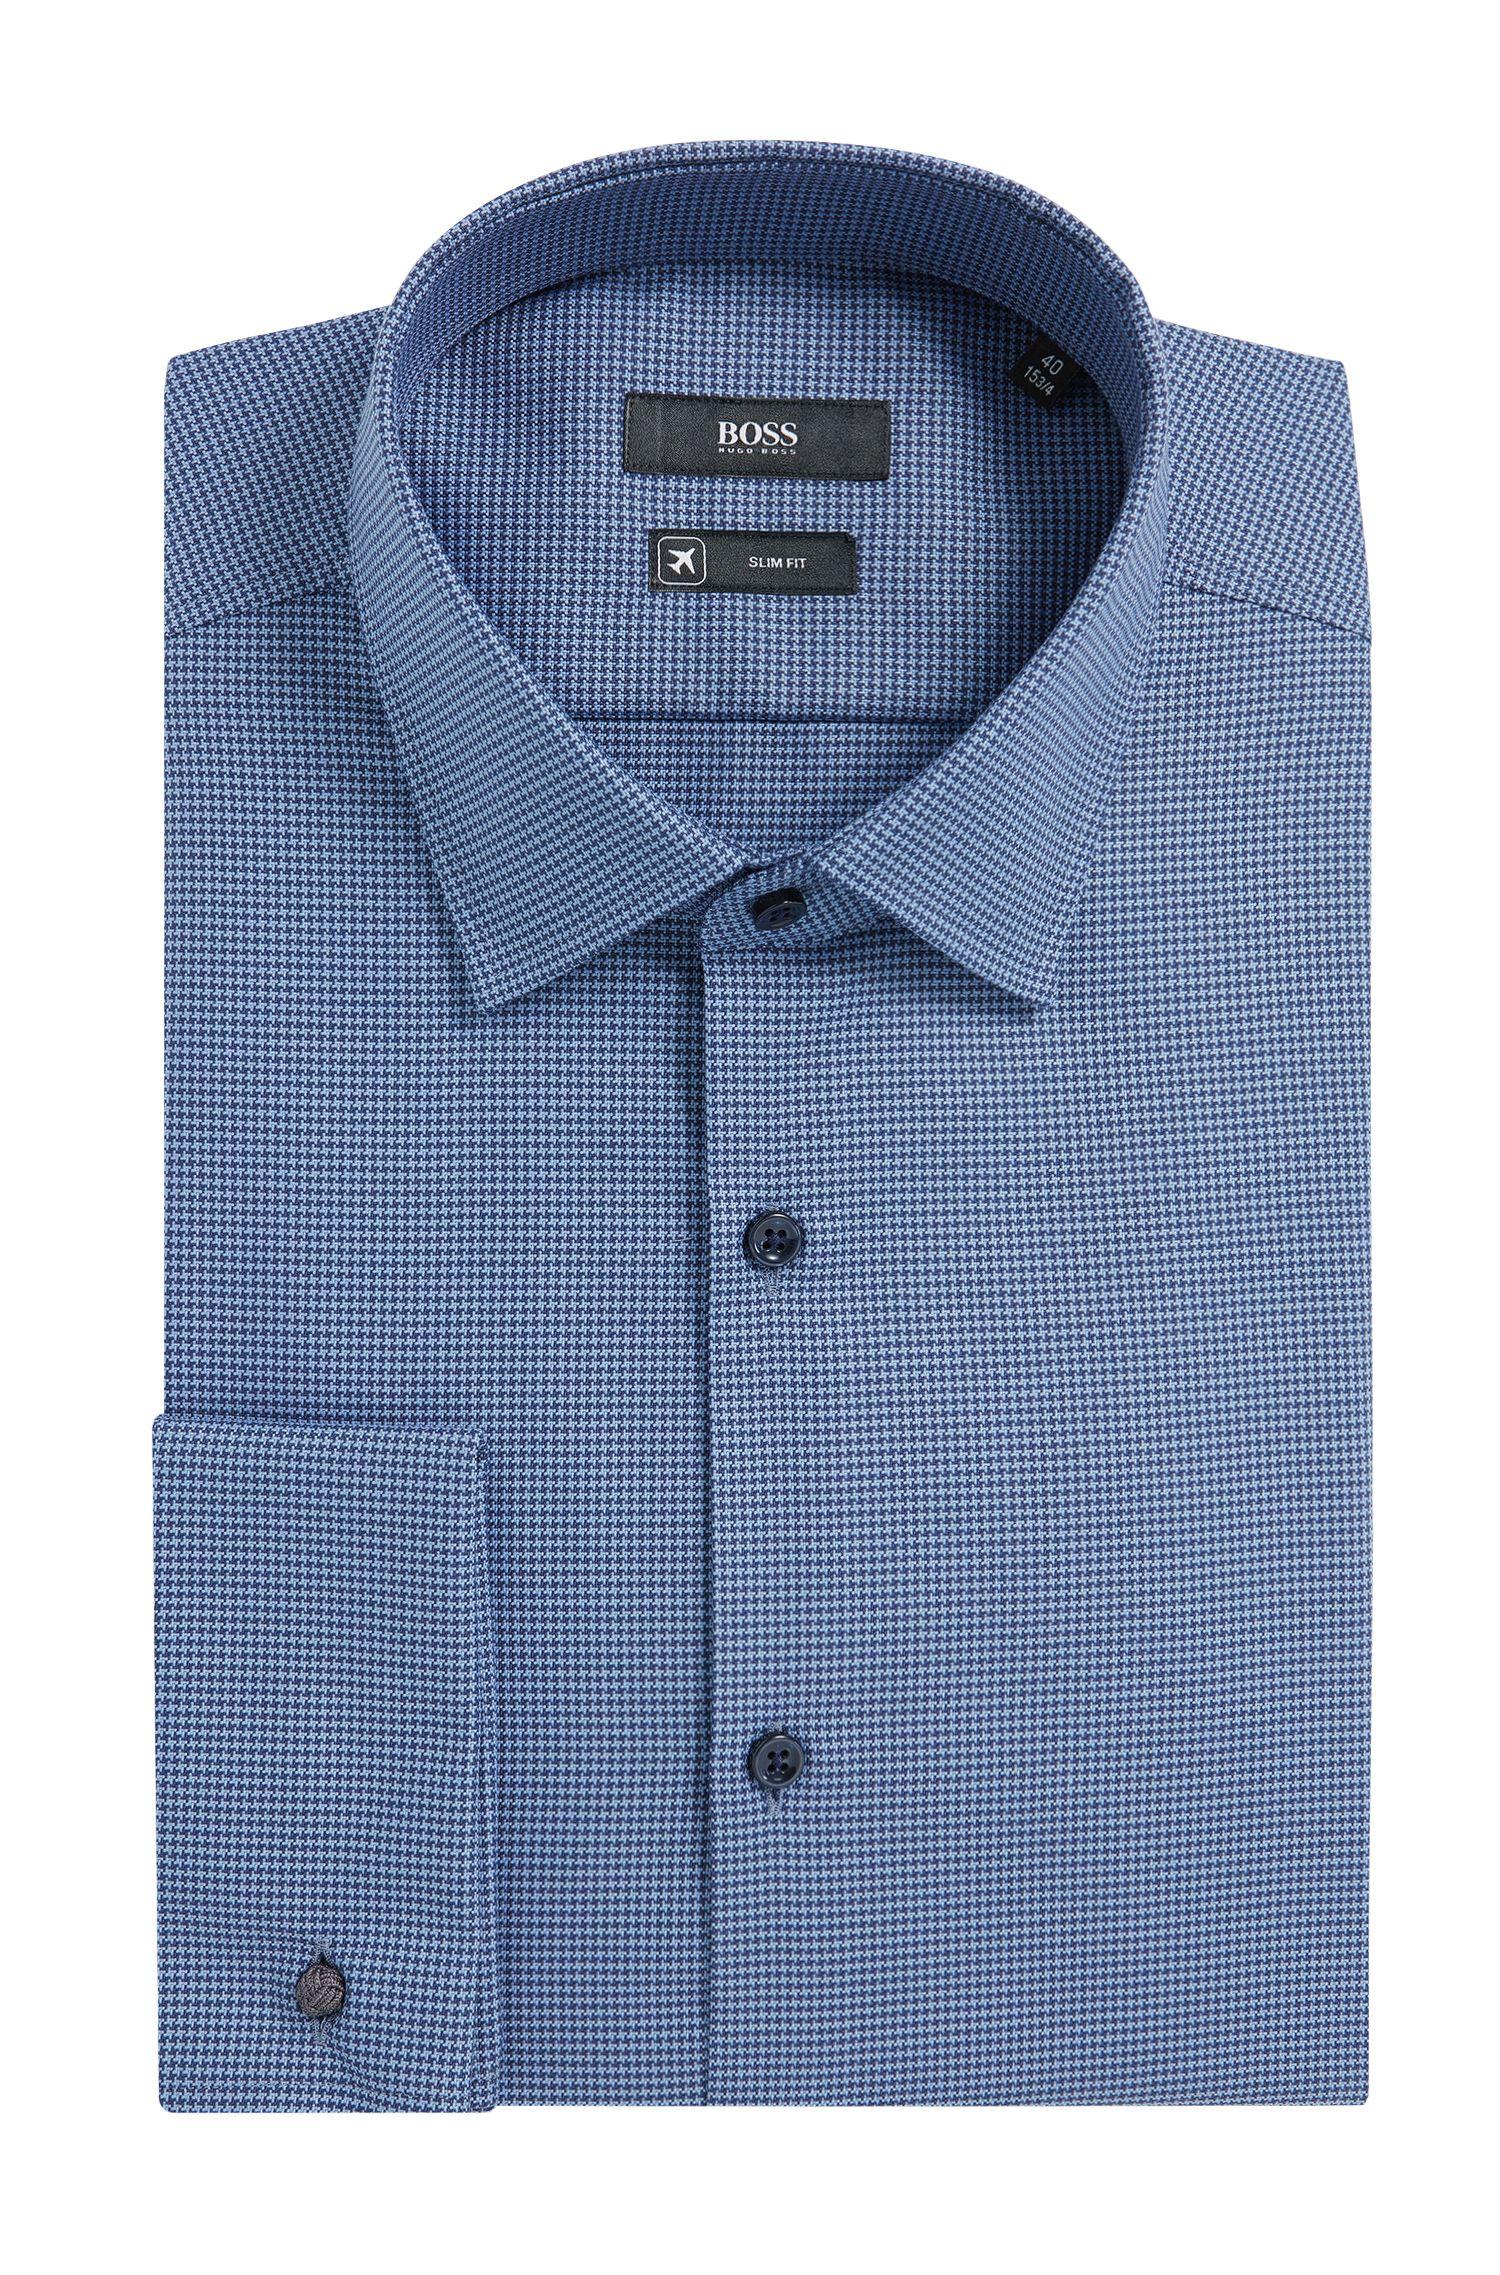 Houndstooth Fresh Active Traveler Cotton Dress Shirt, Slim Fit | Jacques